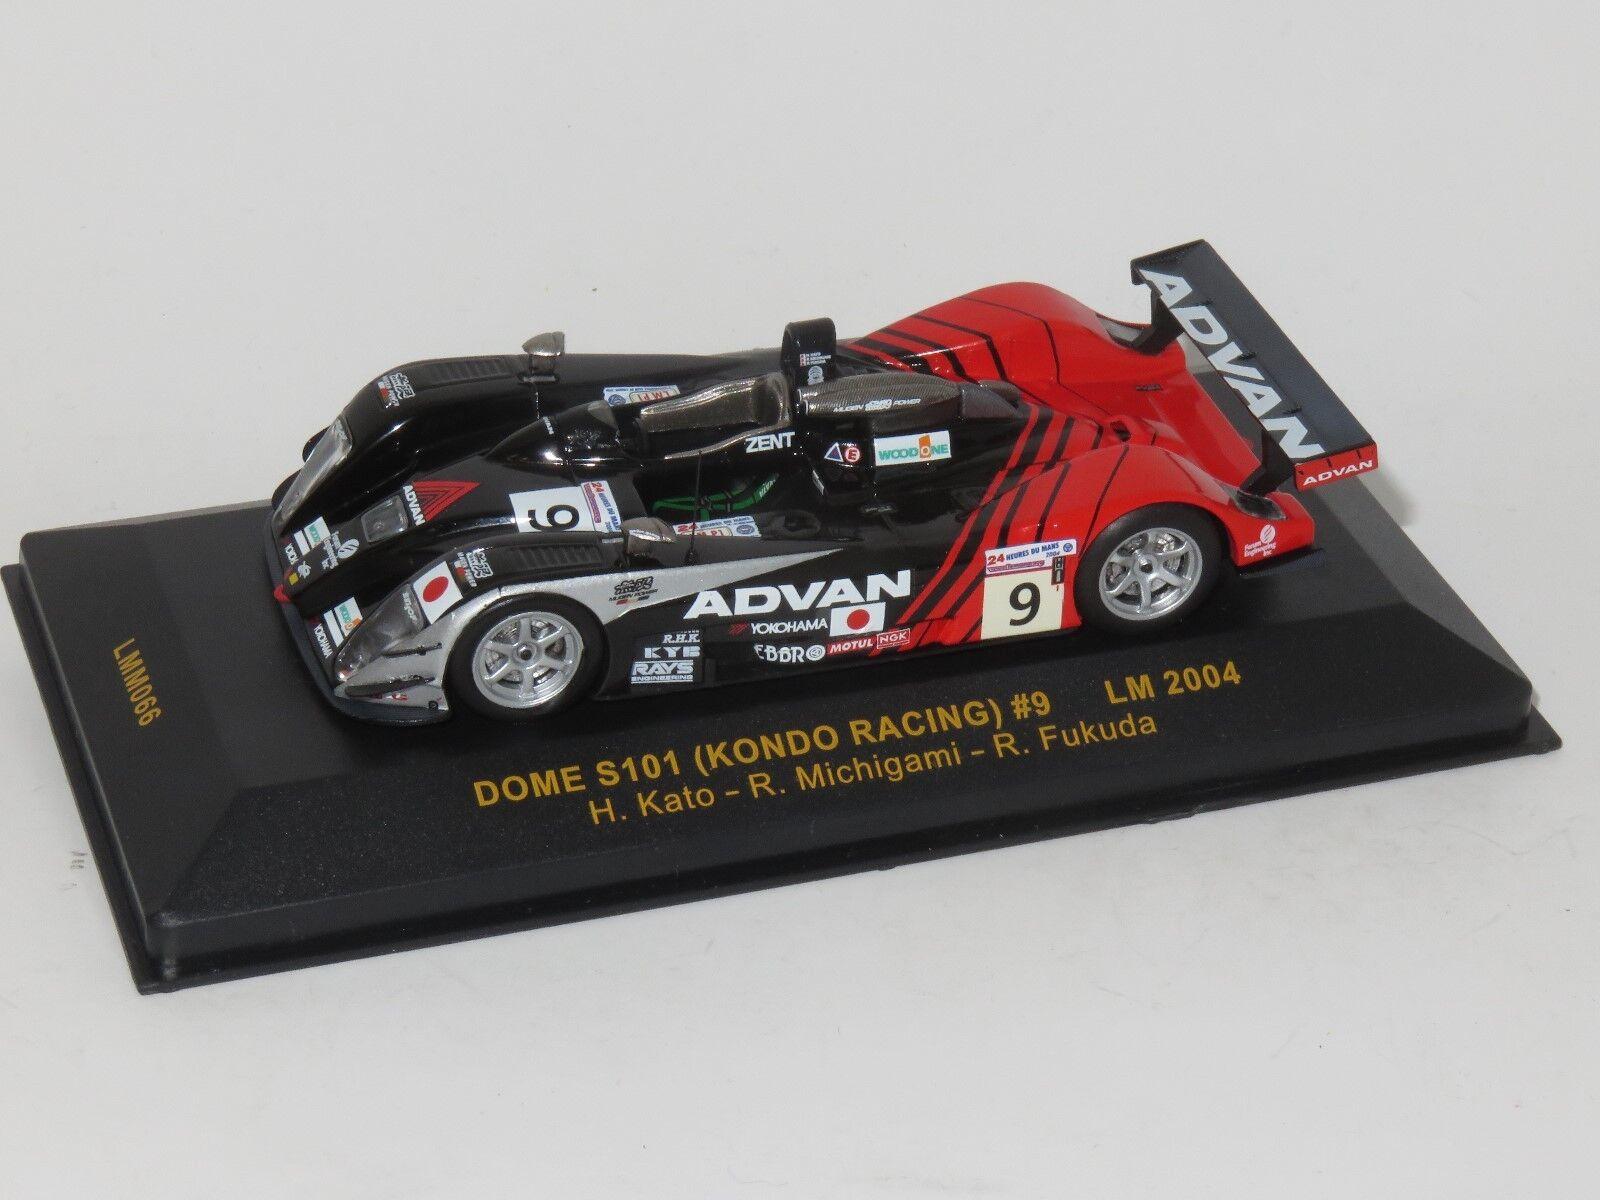 1 43 43 43 Dome S101 Mugen  Kondo Racing   Le Mans 24 Hrs 2004 b471f1